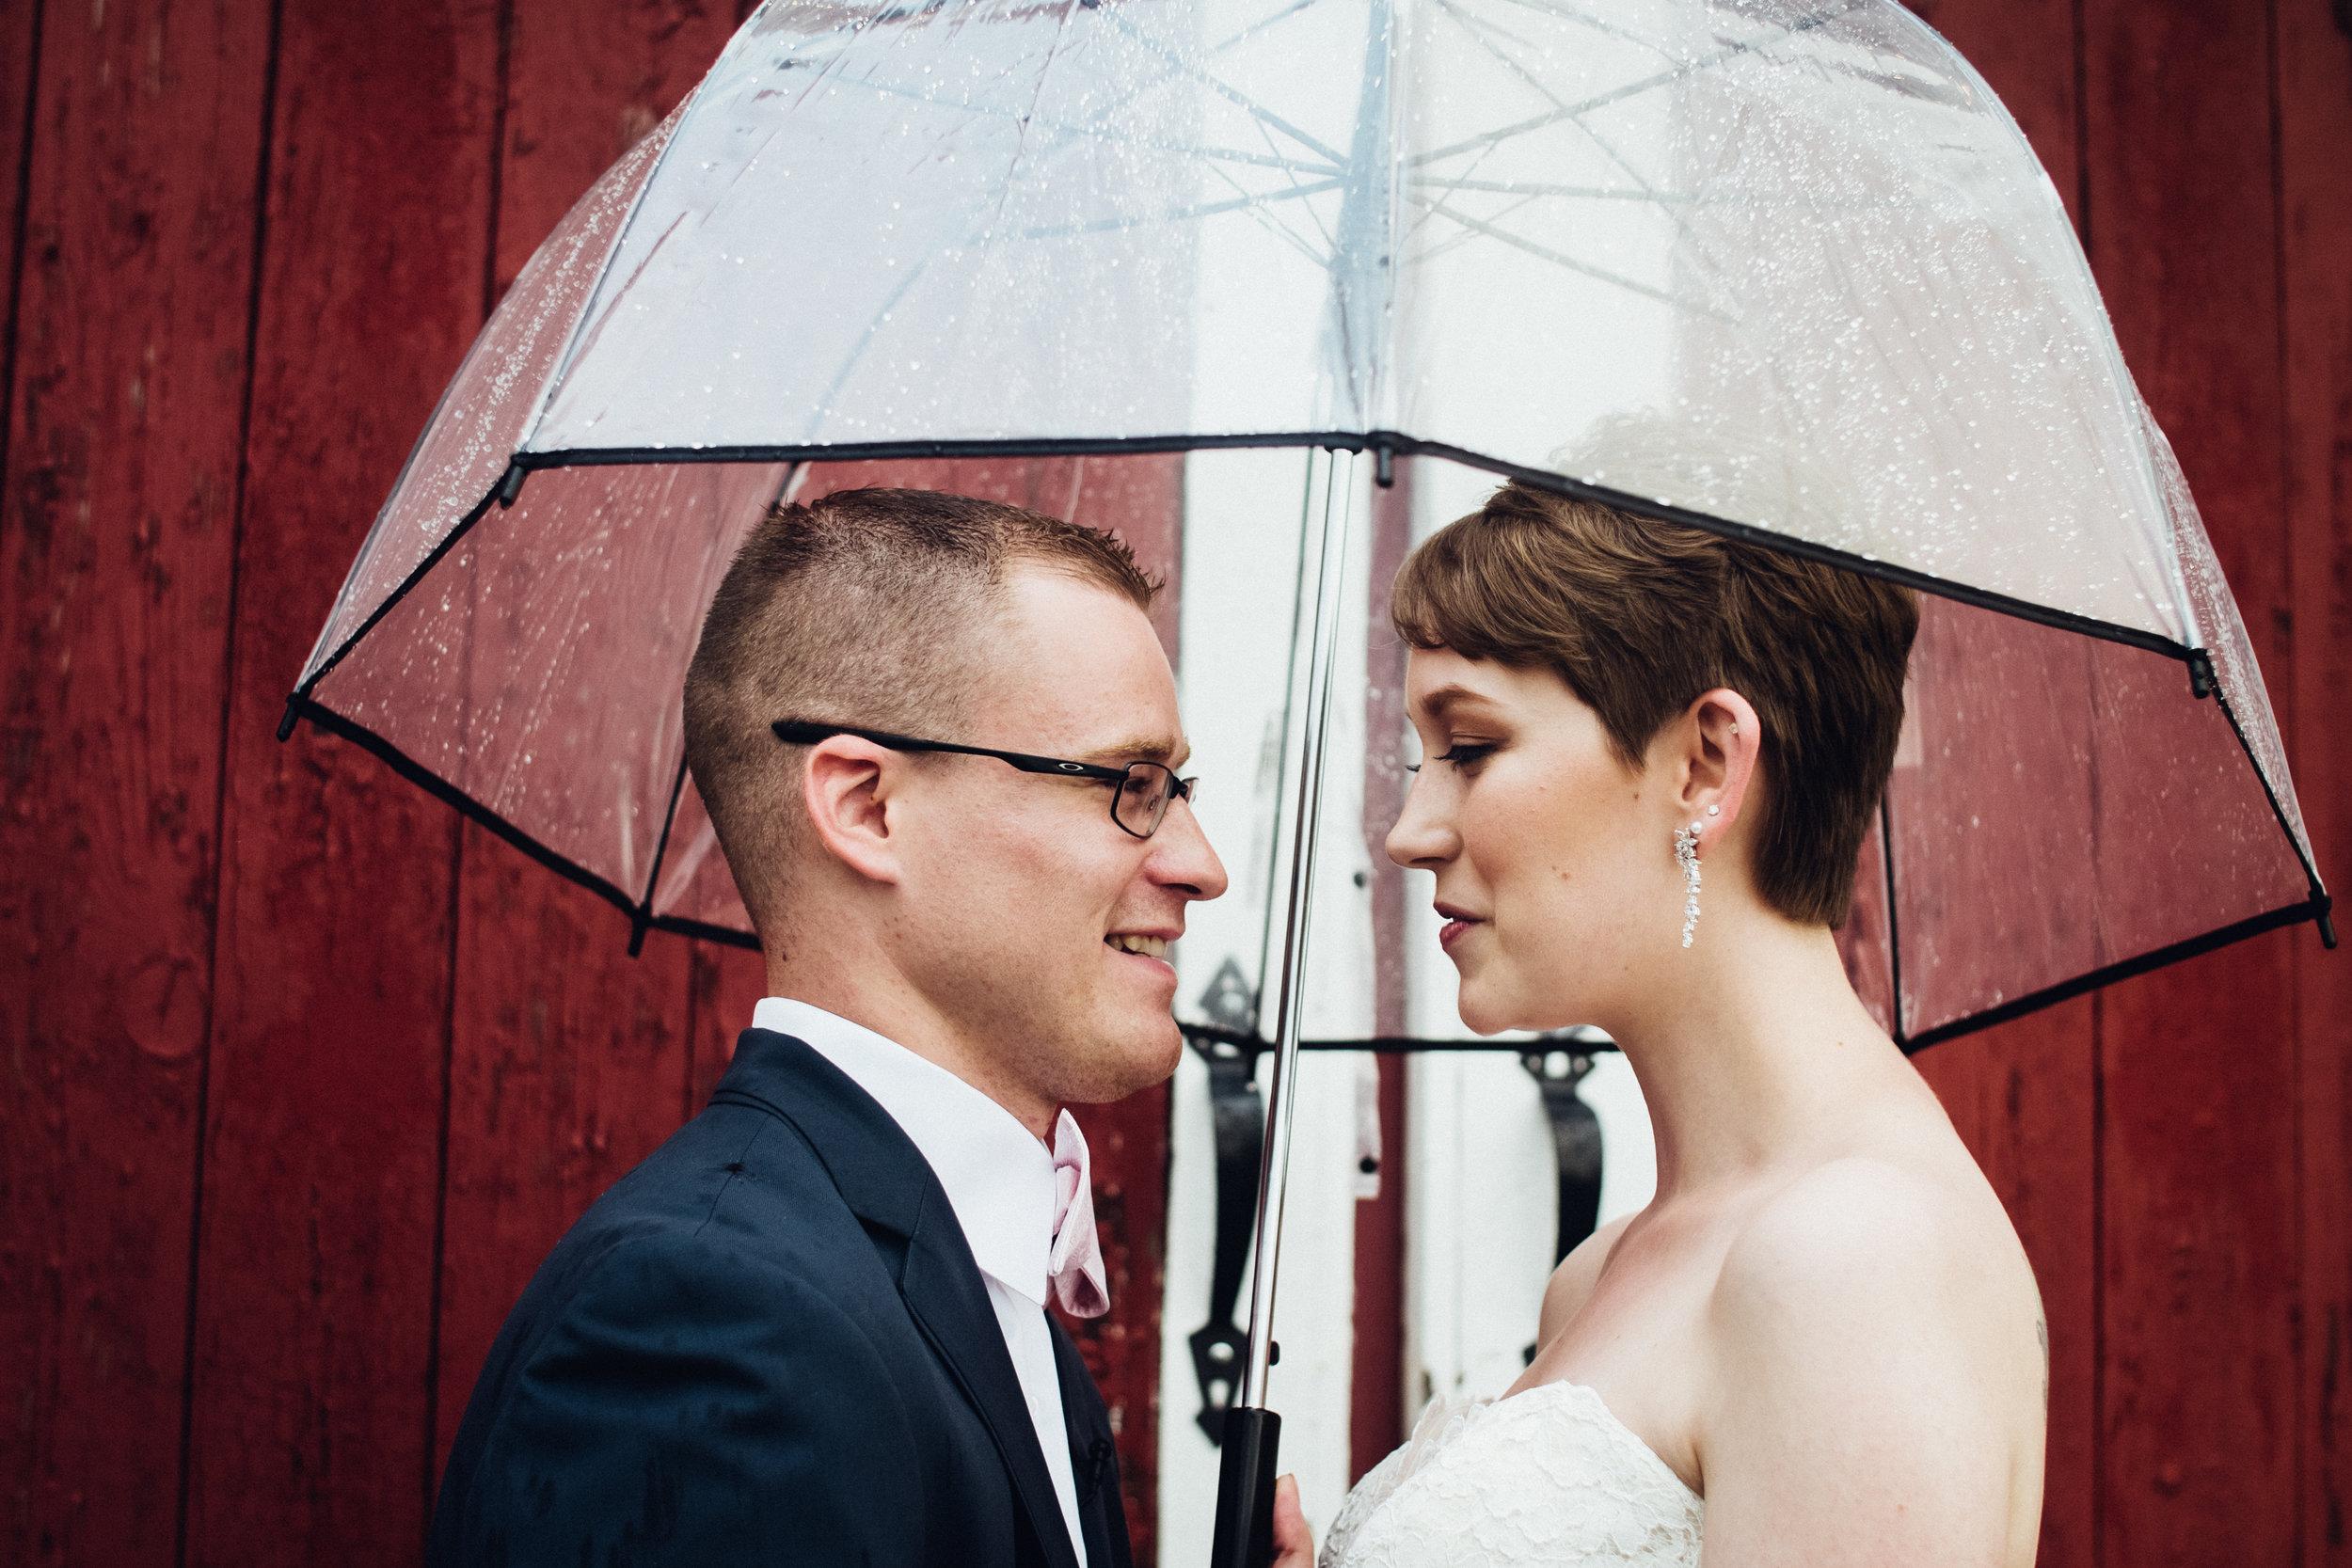 The-Centennial-Barn-Wedding-Videographers-Videography-Photographers-Photography-West-Michigan-North-Carolina-Grand-Rapids-Shadow-Shine-Pictures